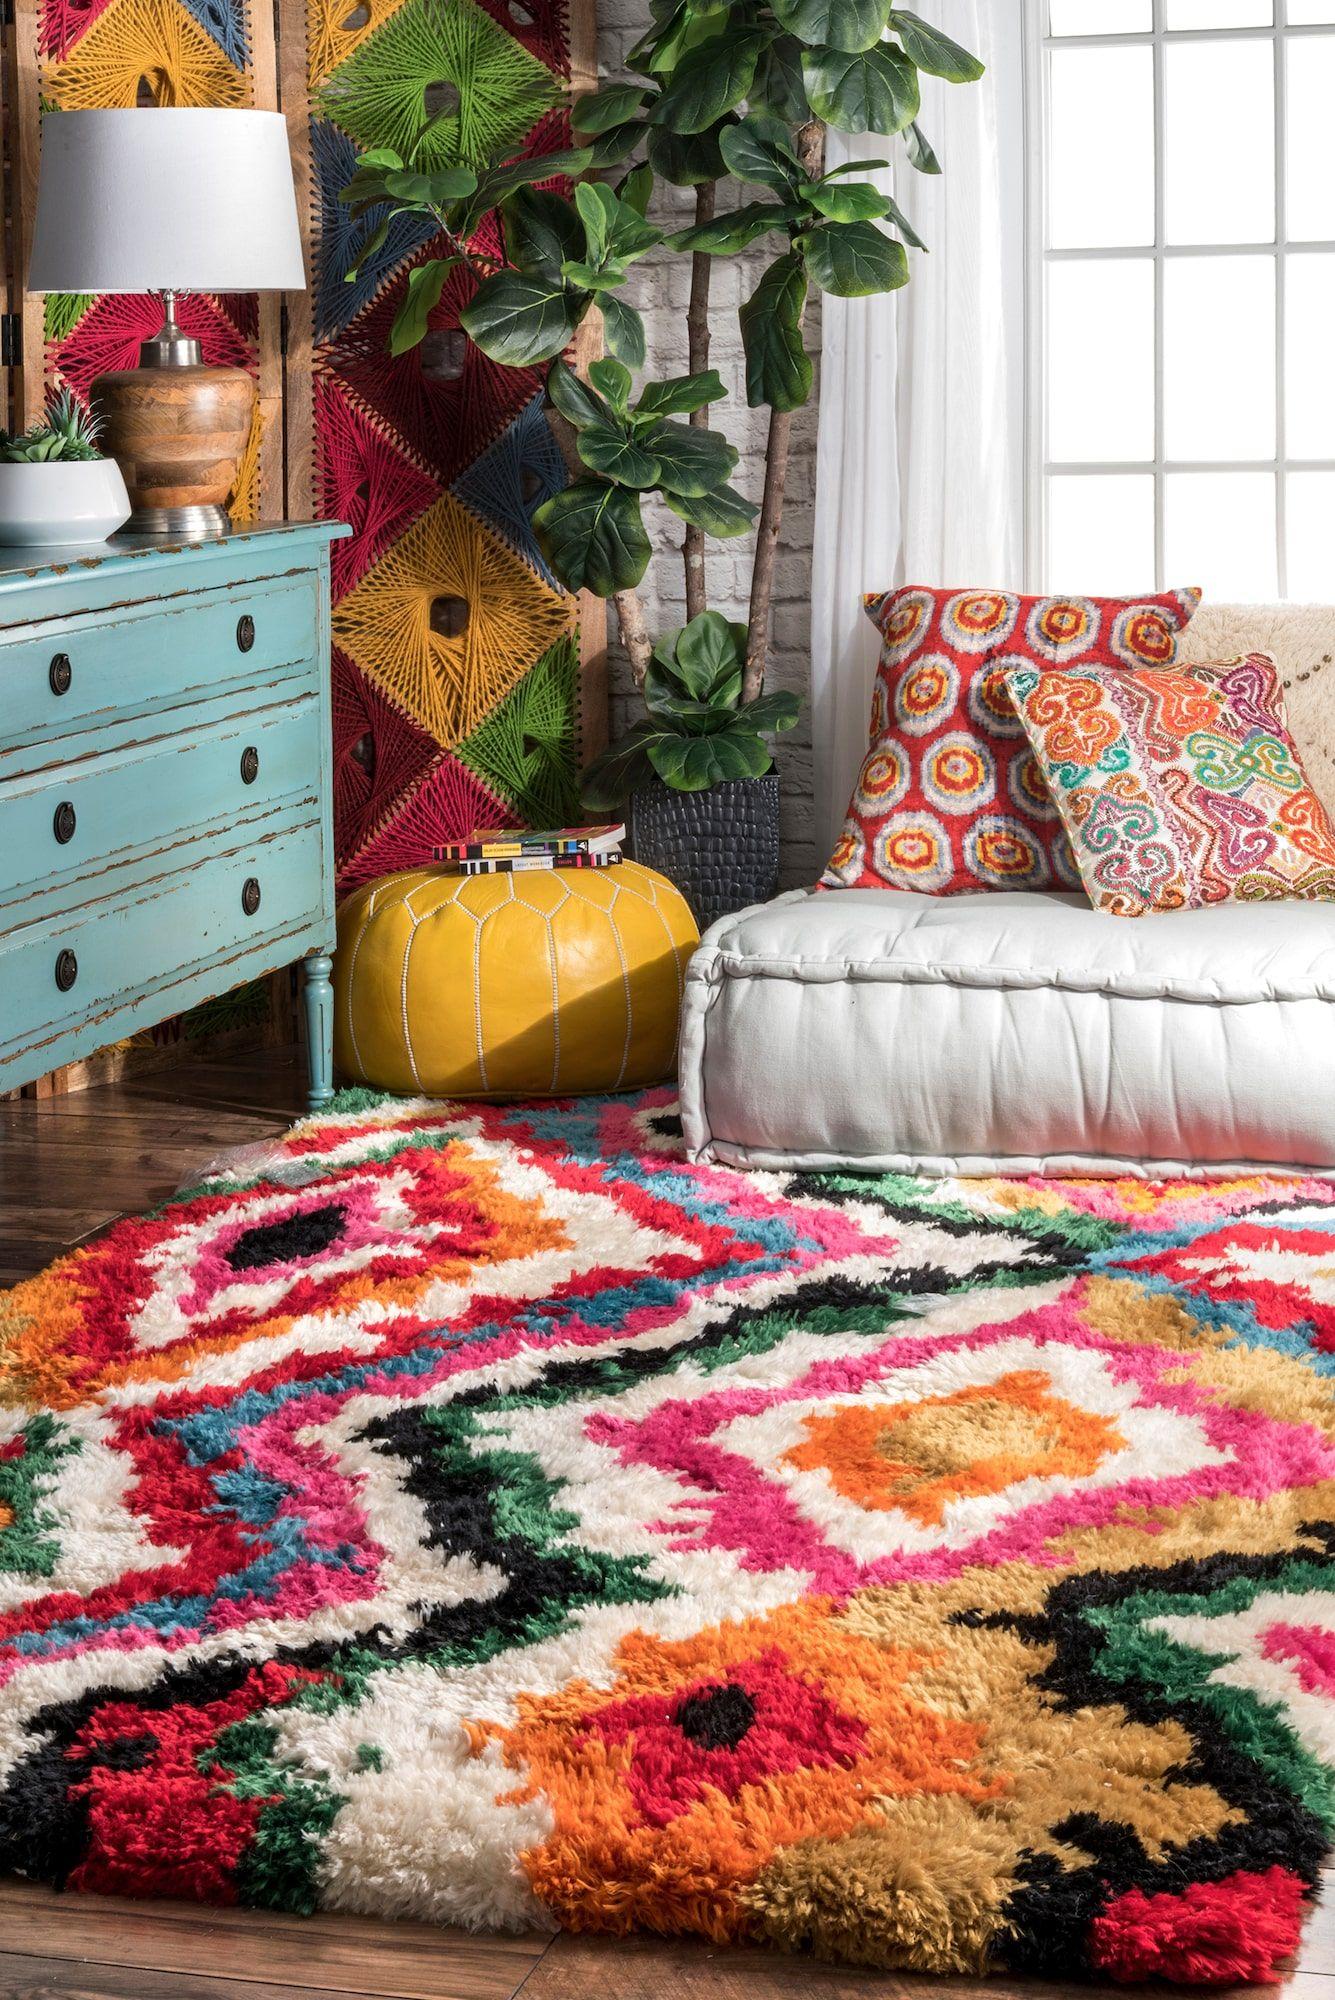 ferris carnival shag rug decor rugs usa bohemian decor on boho chic kitchen rugs id=29877